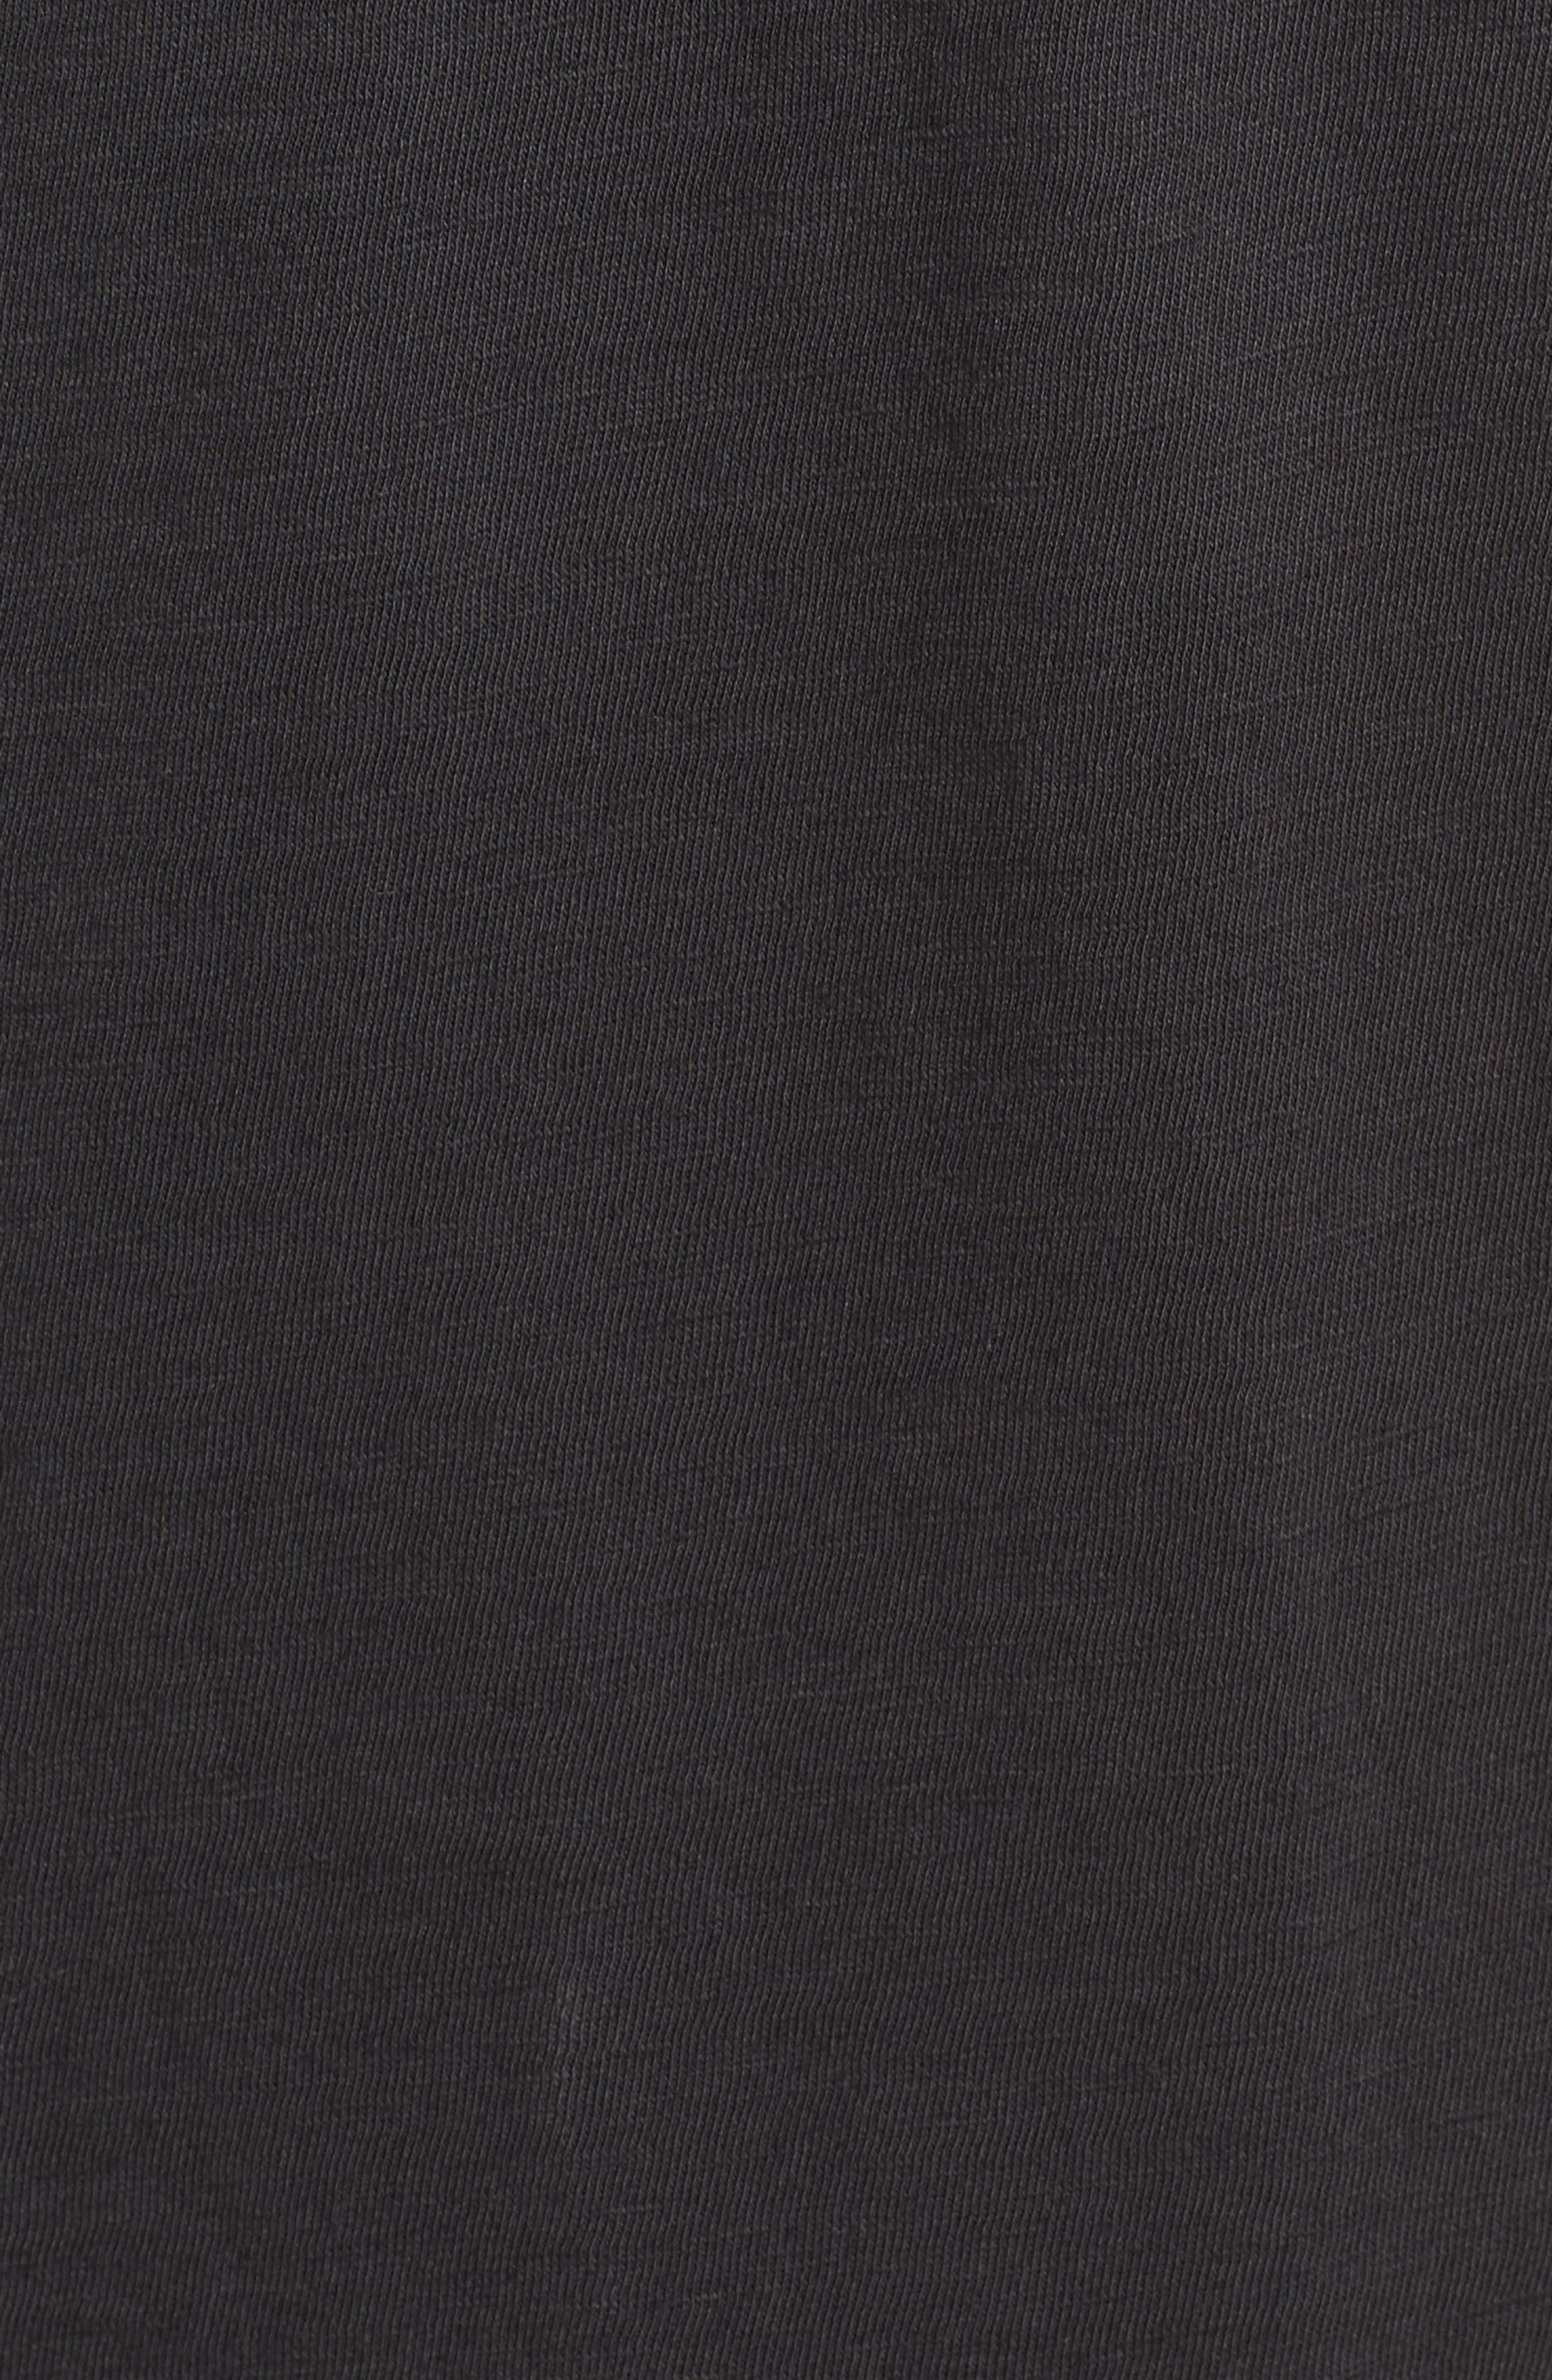 Sunset Eagle Pocket T-Shirt,                             Alternate thumbnail 5, color,                             002